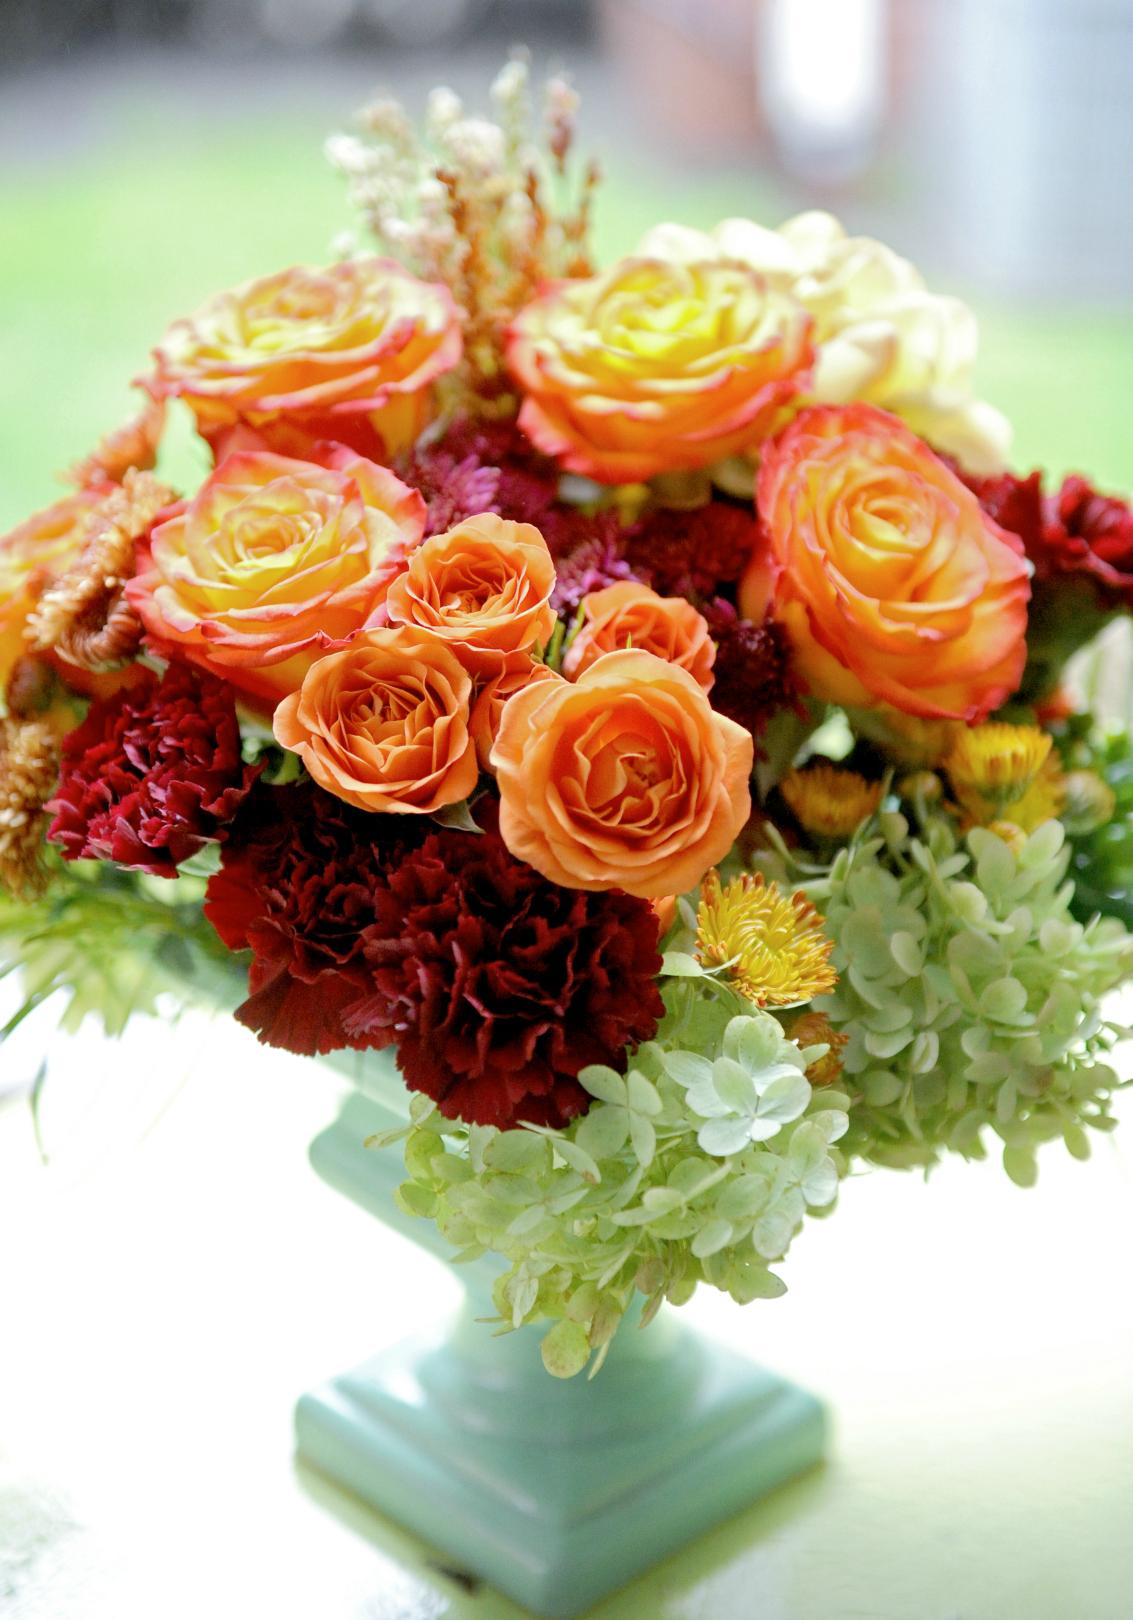 floral-0704 copy.jpg